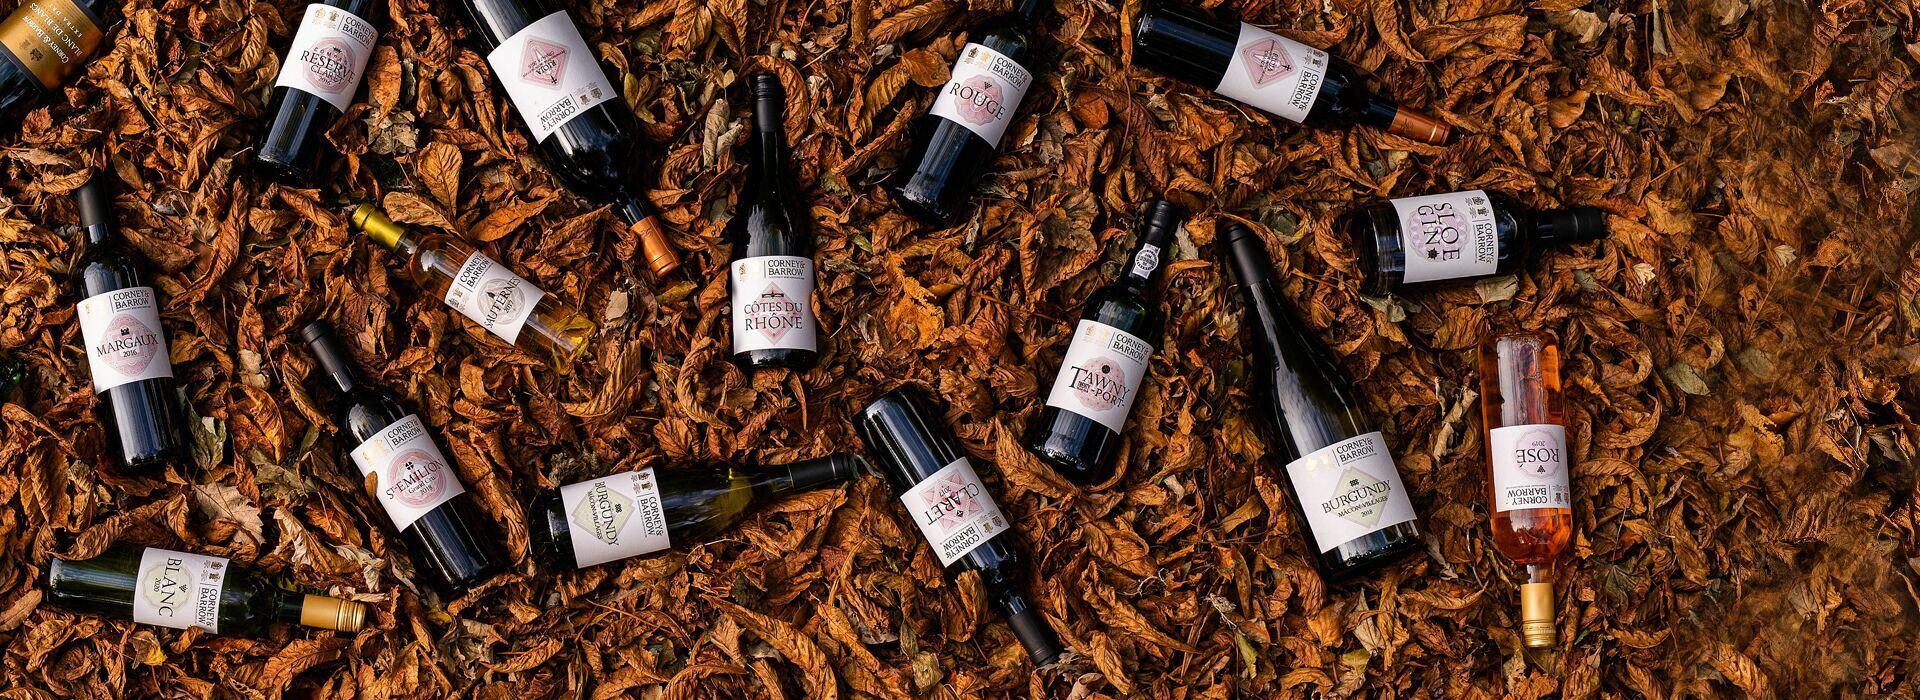 Corney & Barrow Own Label Wines